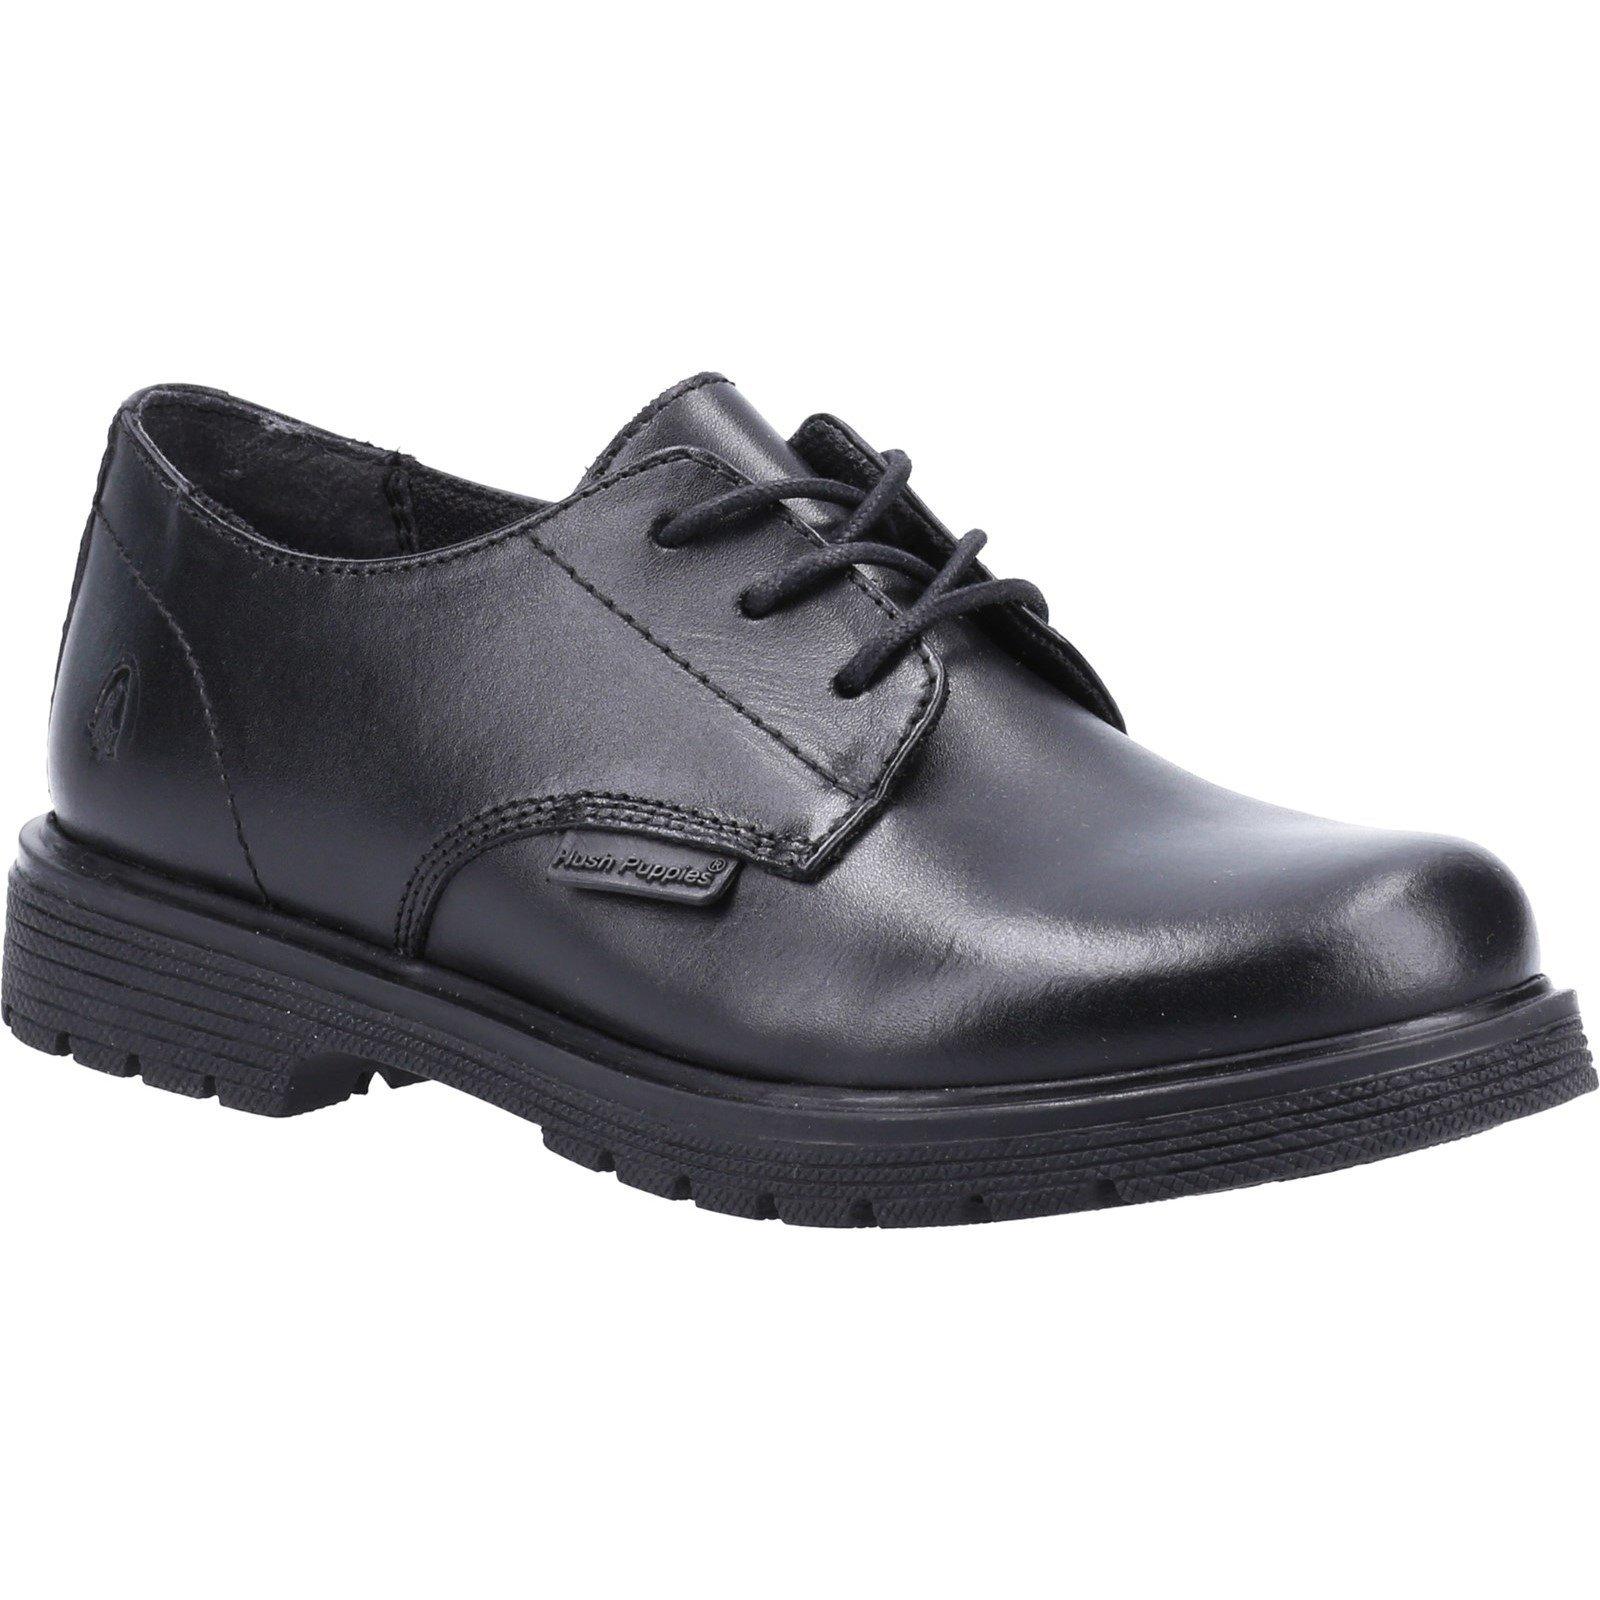 Hush Puppies Kid's Remi Senior School Derby Shoe Black 32613 - Black 3